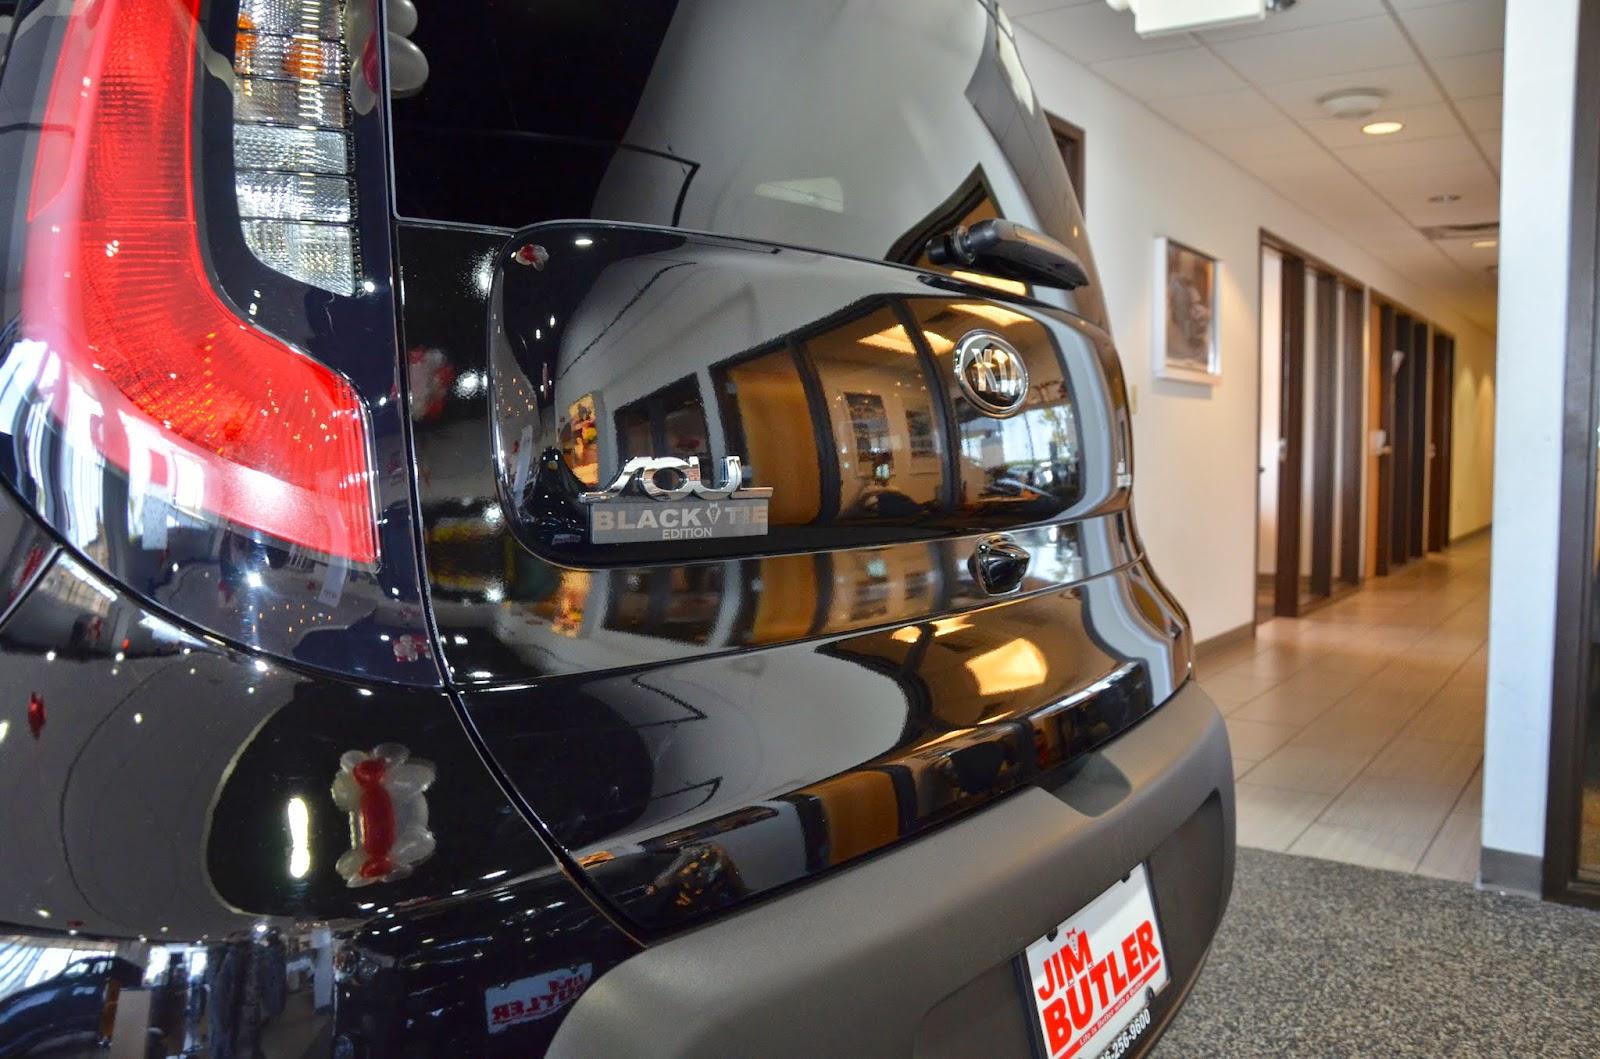 pay st girardeau dealers auffenburg cerame dodge cars used kia auto louis mo no reviews slider dealership cape saint paul